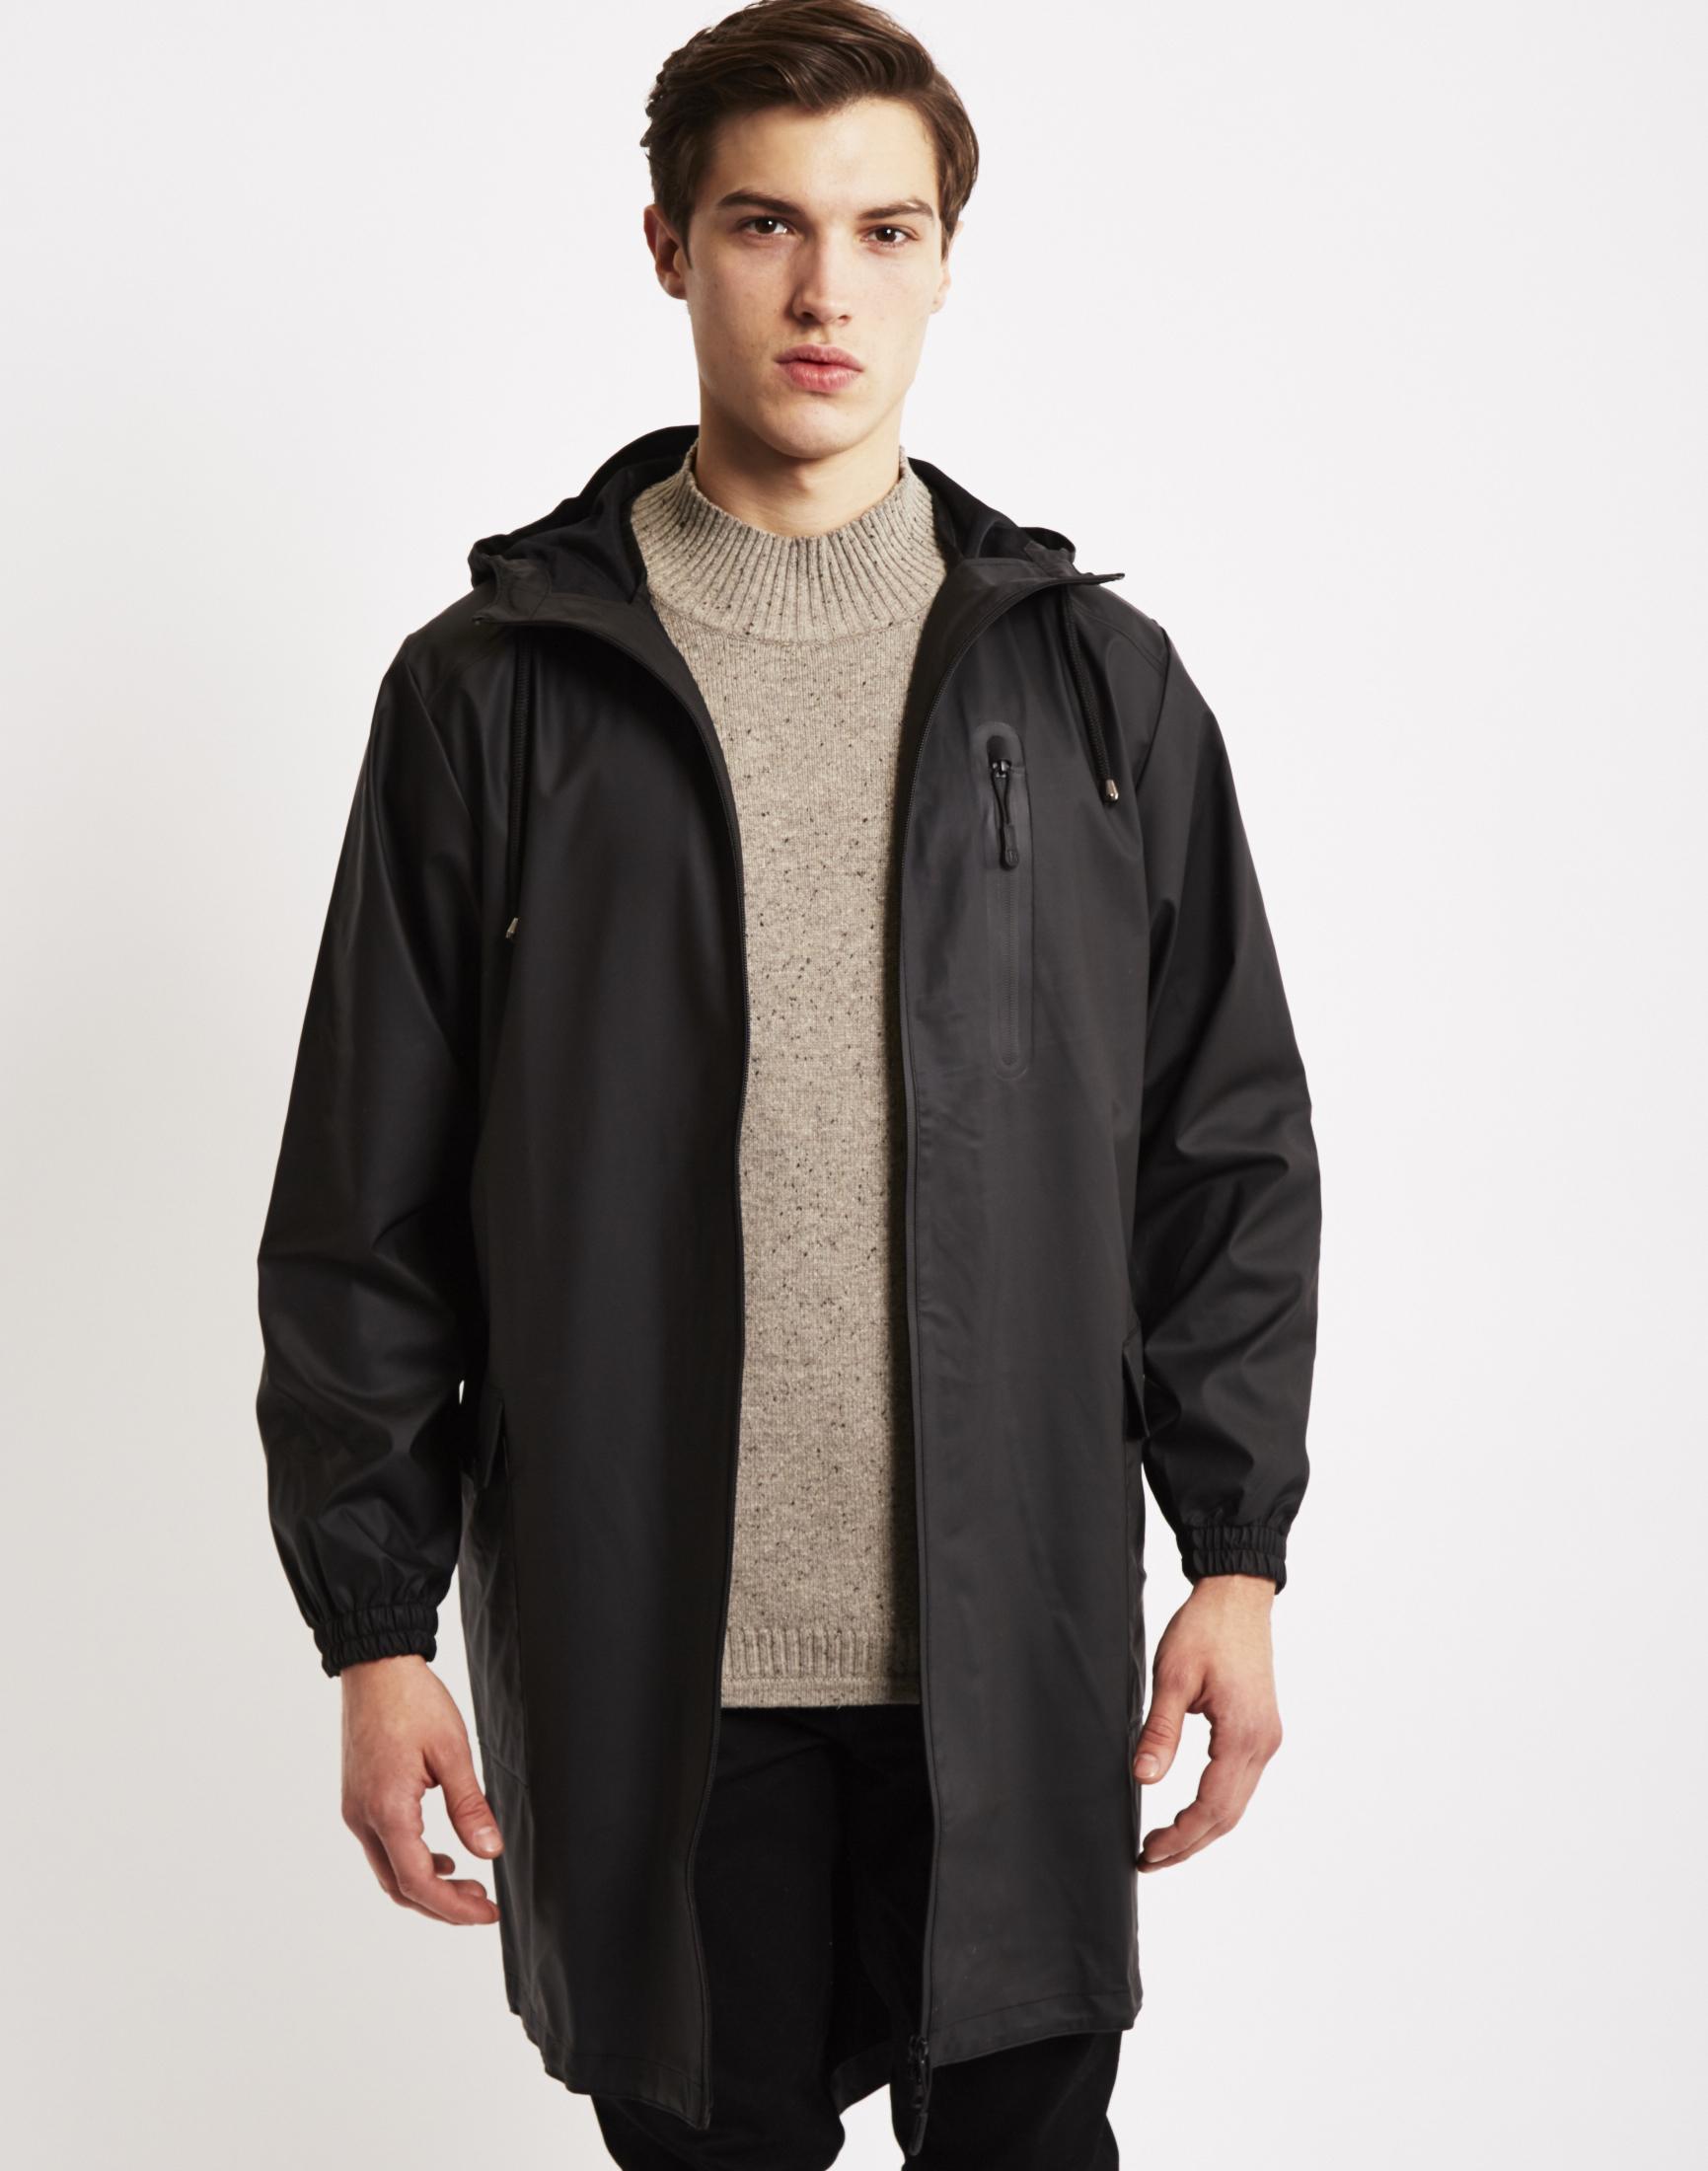 Parka Rain Coat - Coat Nj